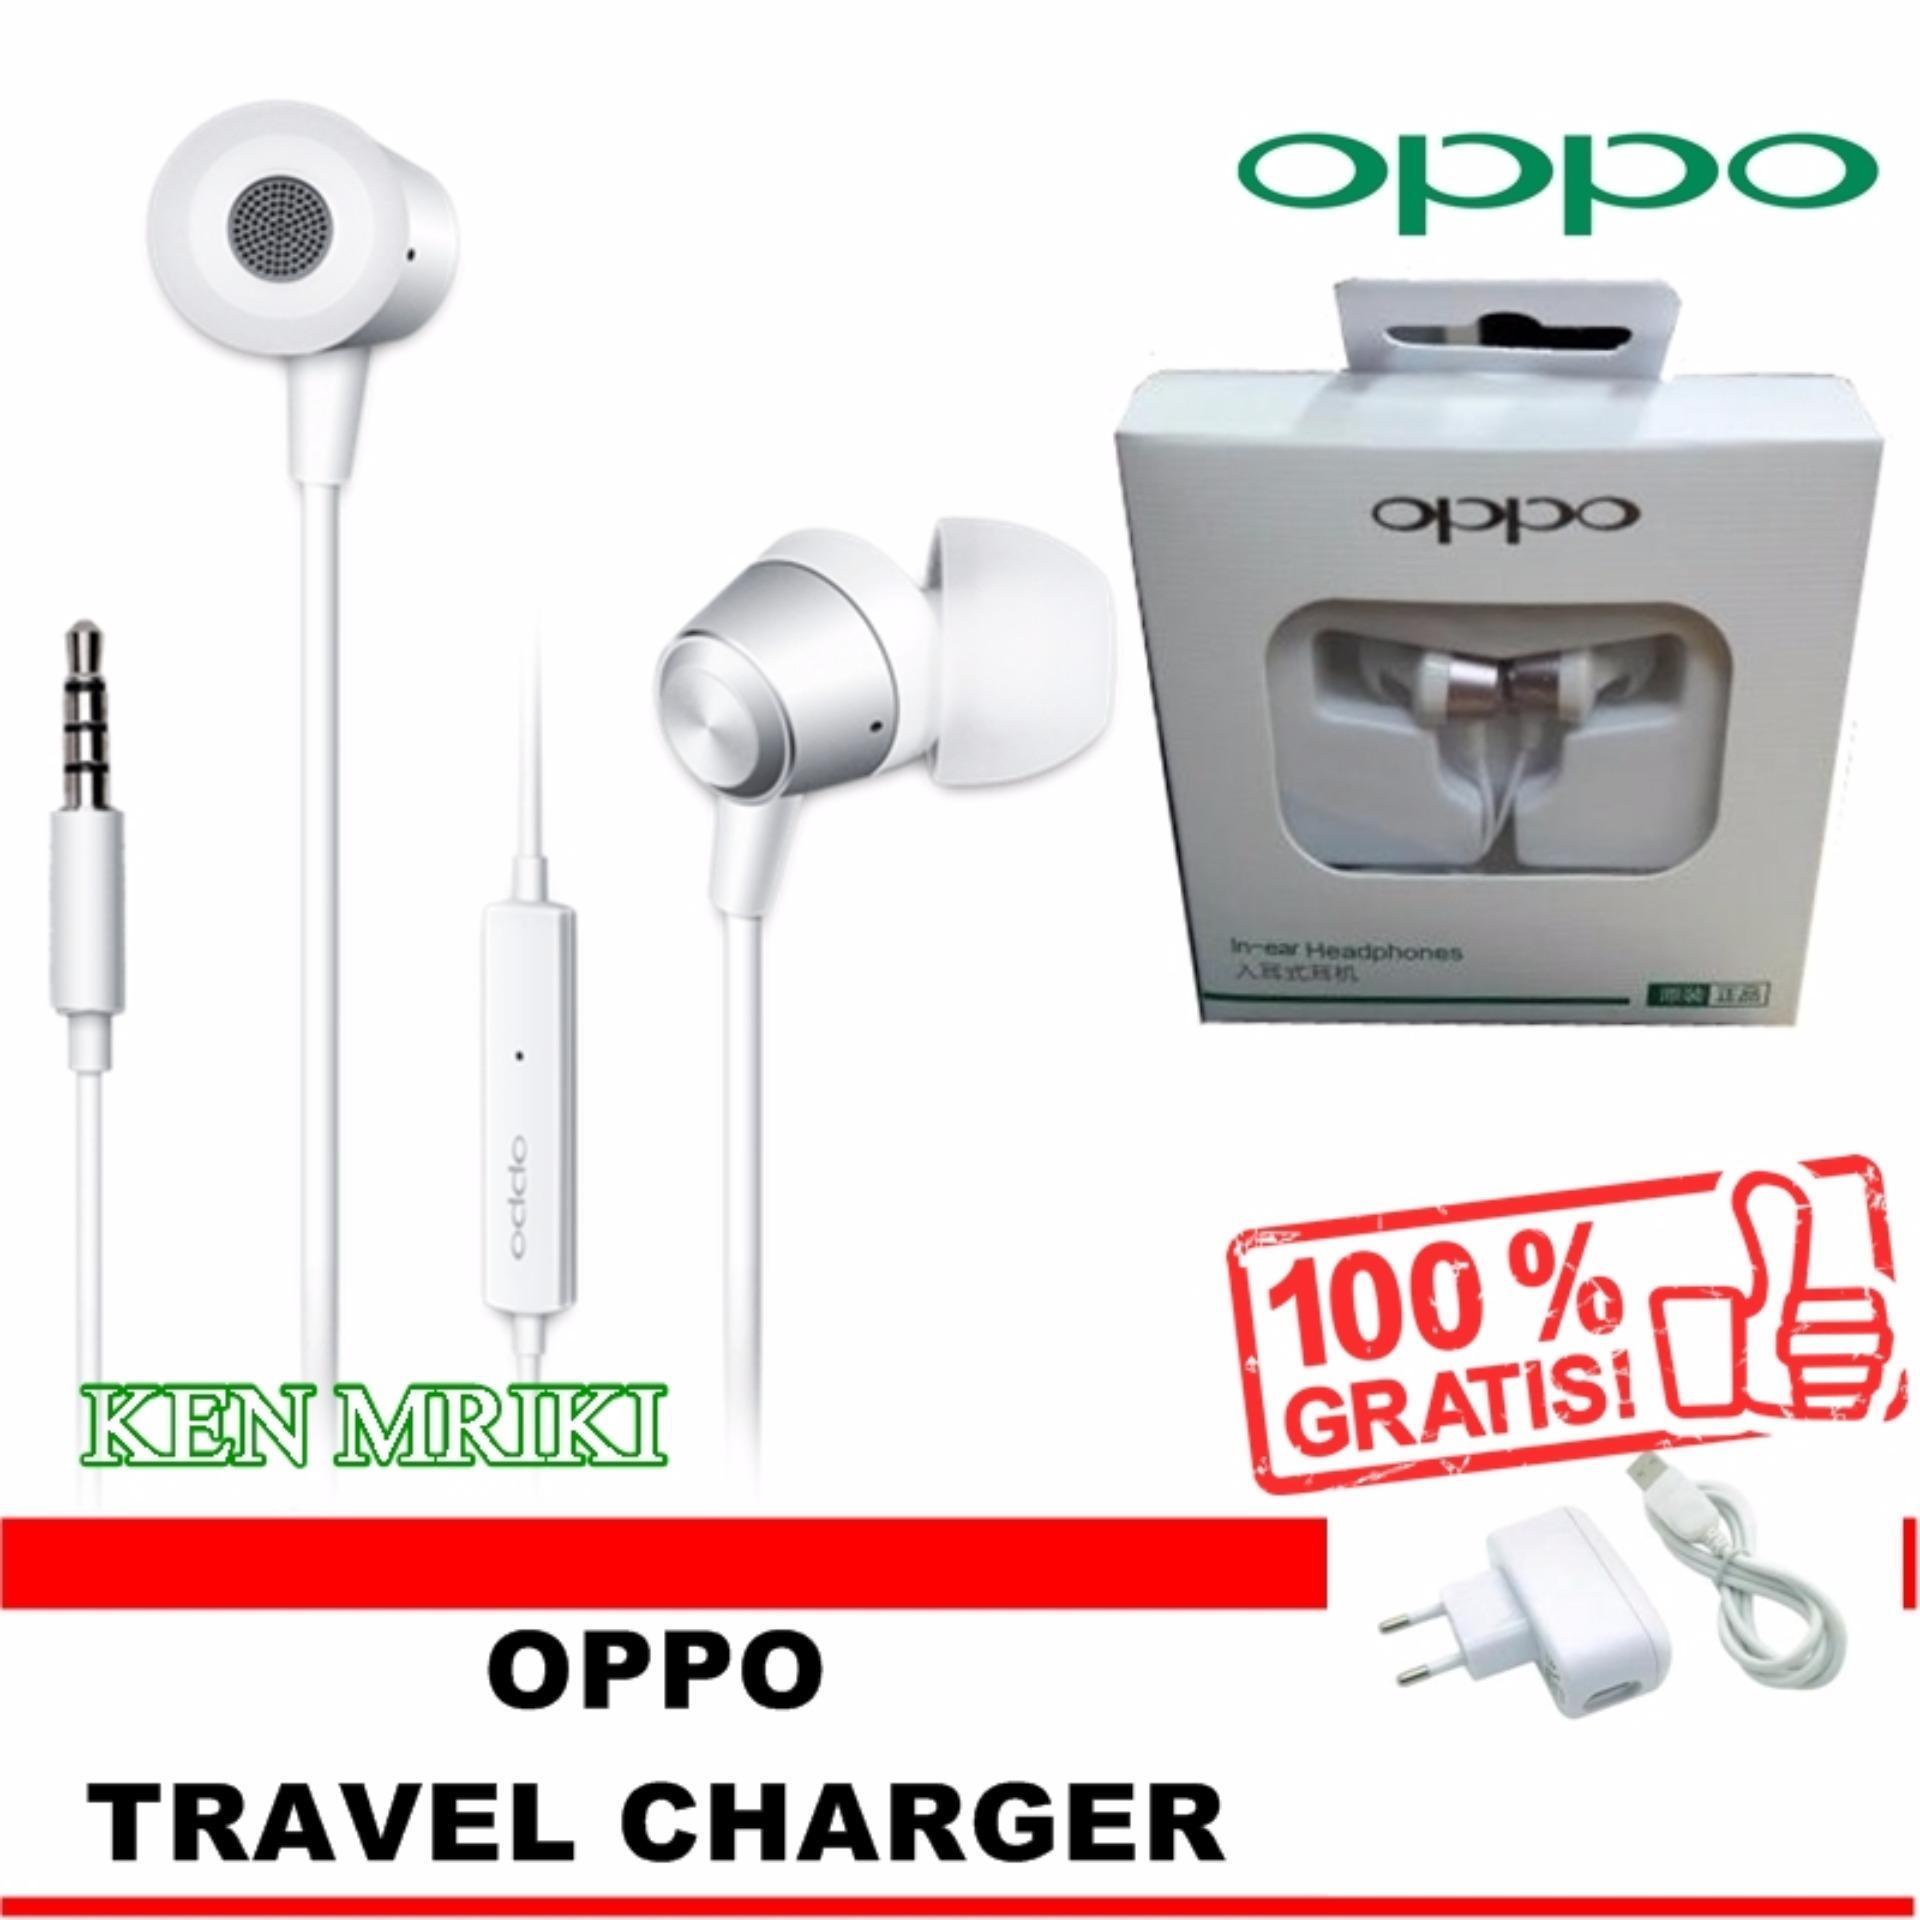 Harga Penawaran Oppo Original Handsfree Mh130 White Earbud Travel Charger Earphones Gratis Chargerwhite